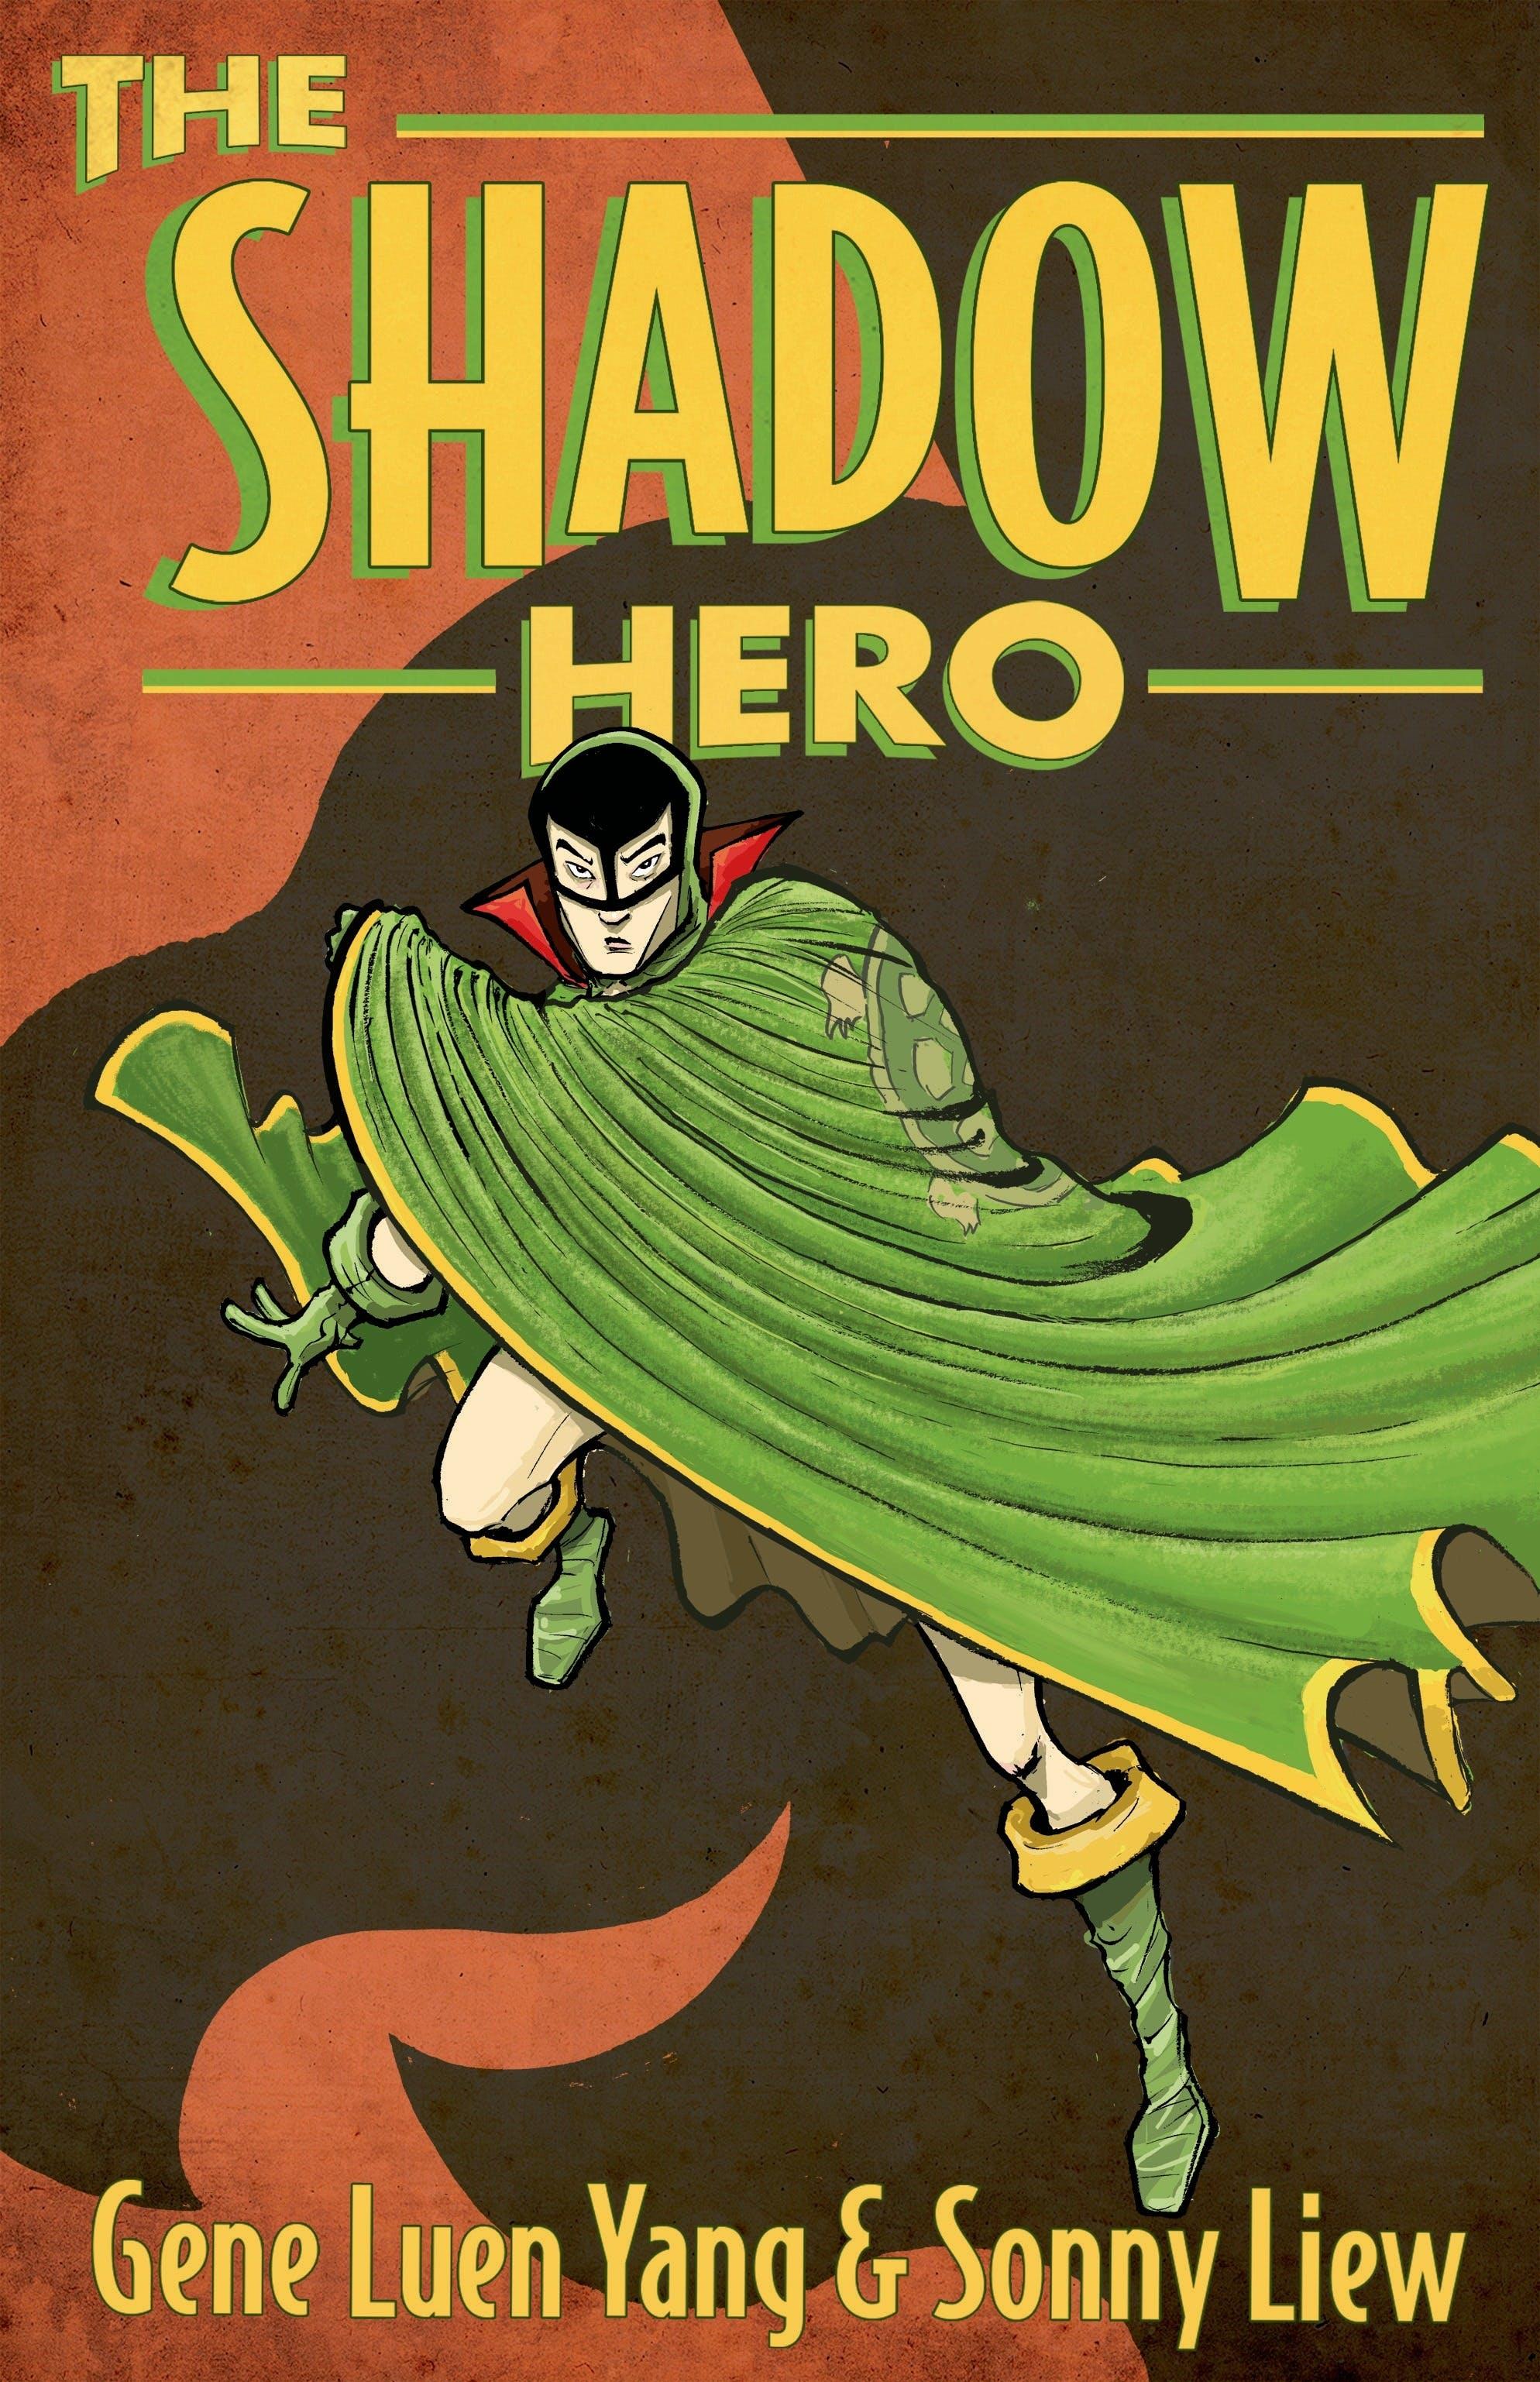 Image of The Shadow Hero